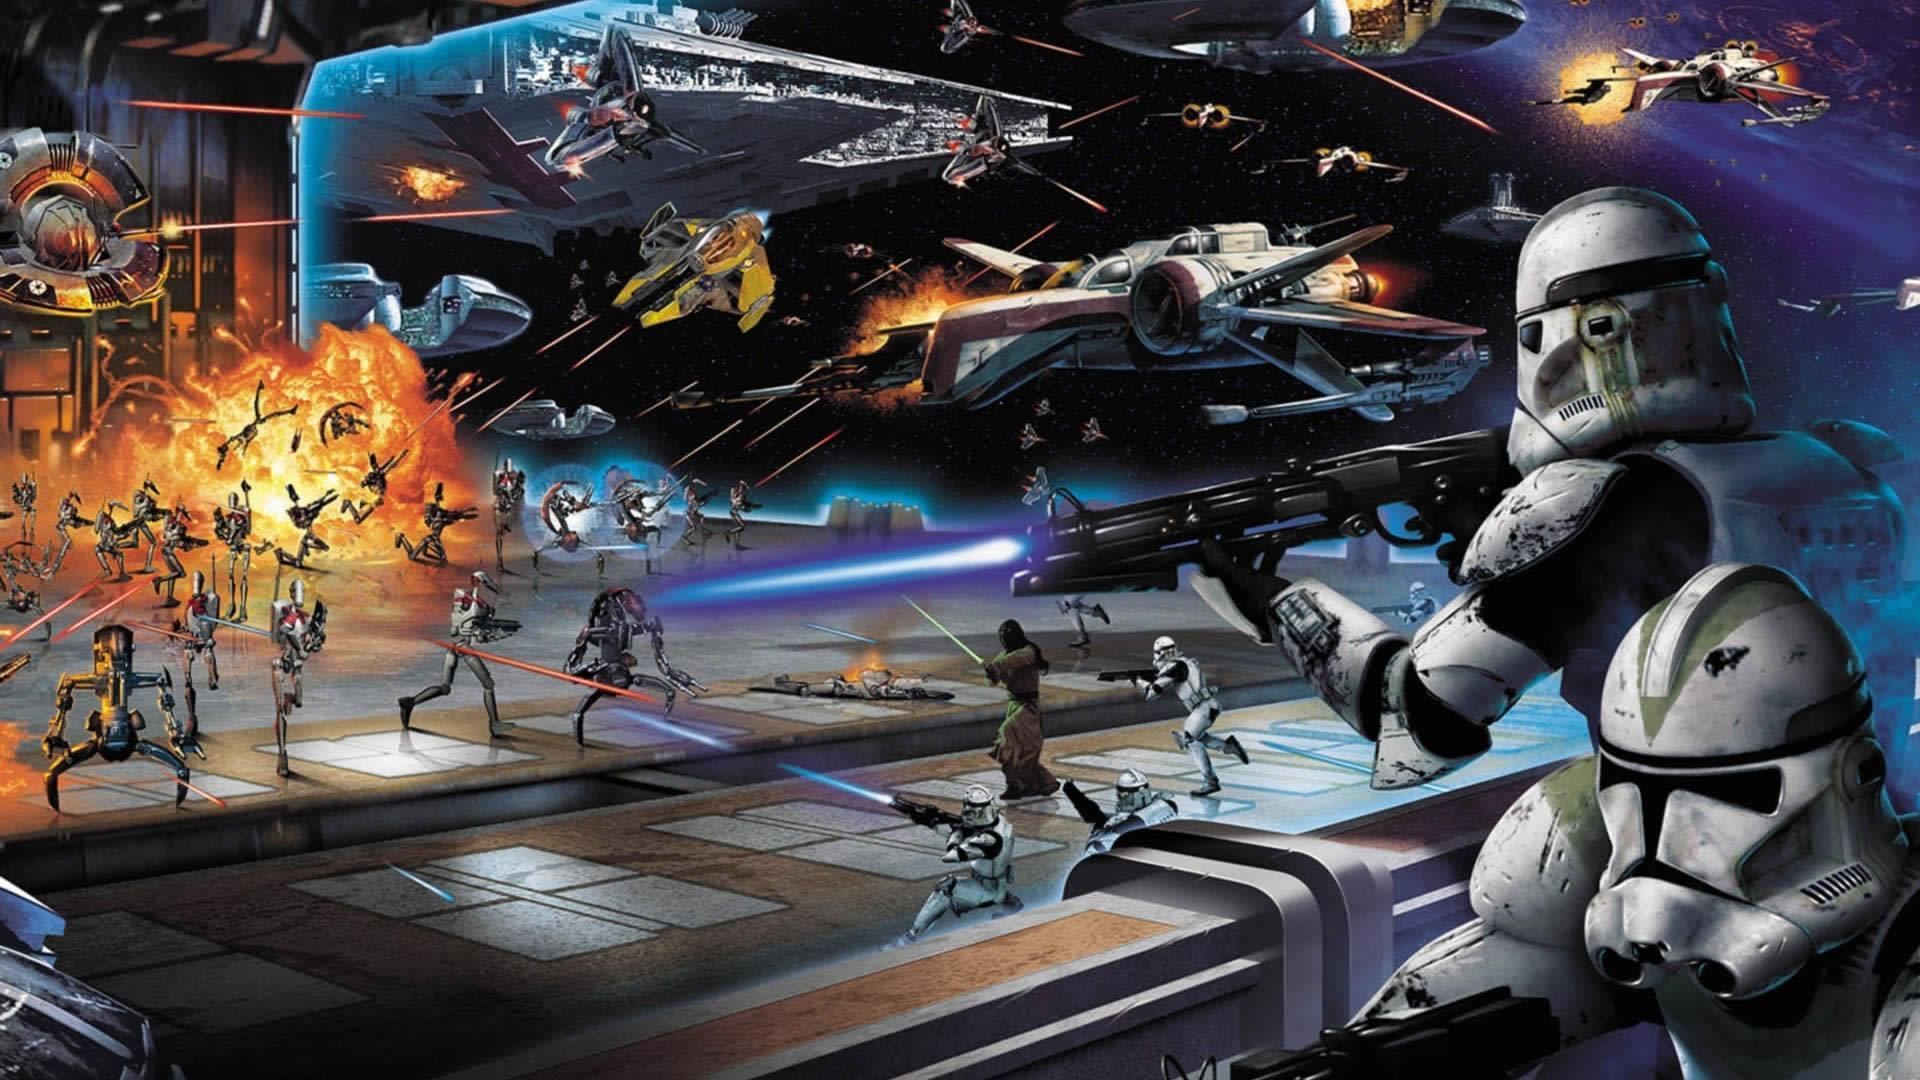 Epic Star Wars Wallpapers - Wallpaper Cave Good Vs Evil War